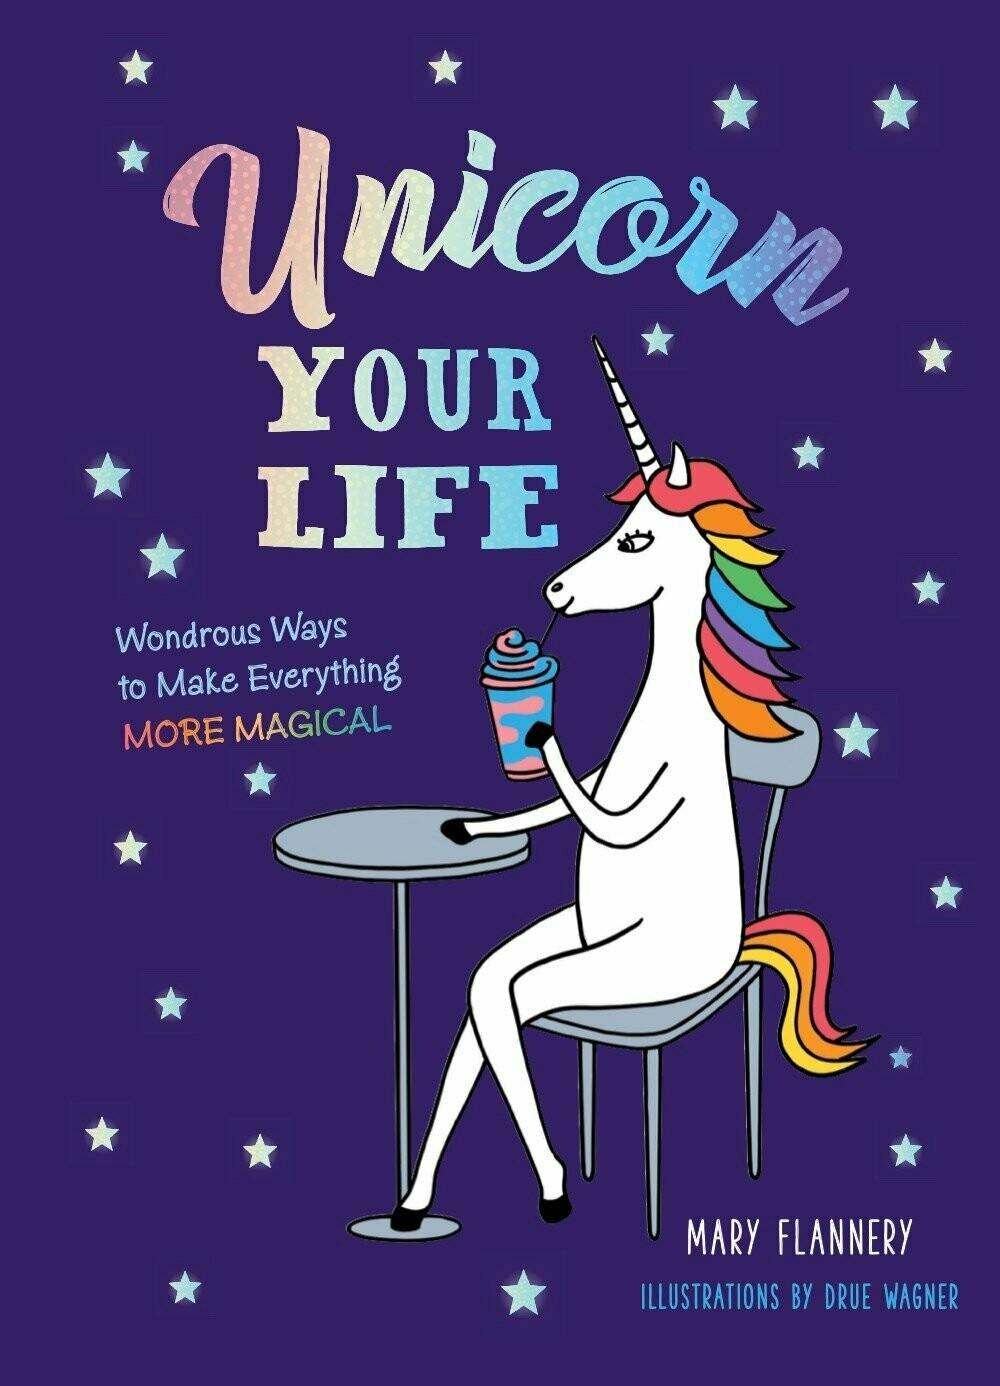 Unicorn Your Life 0204